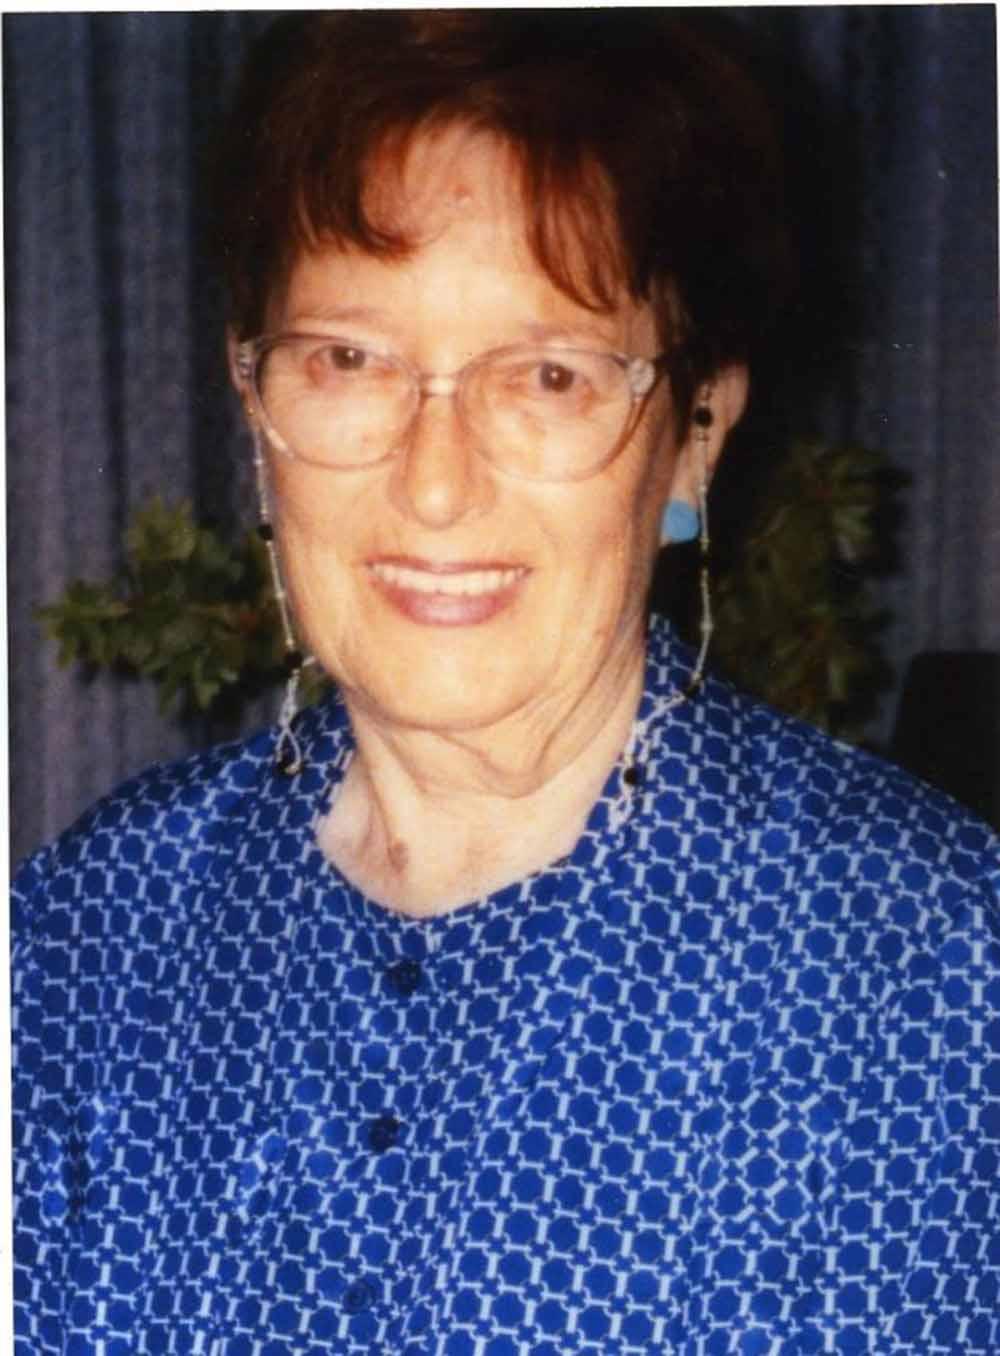 Suzana Szoerenyi